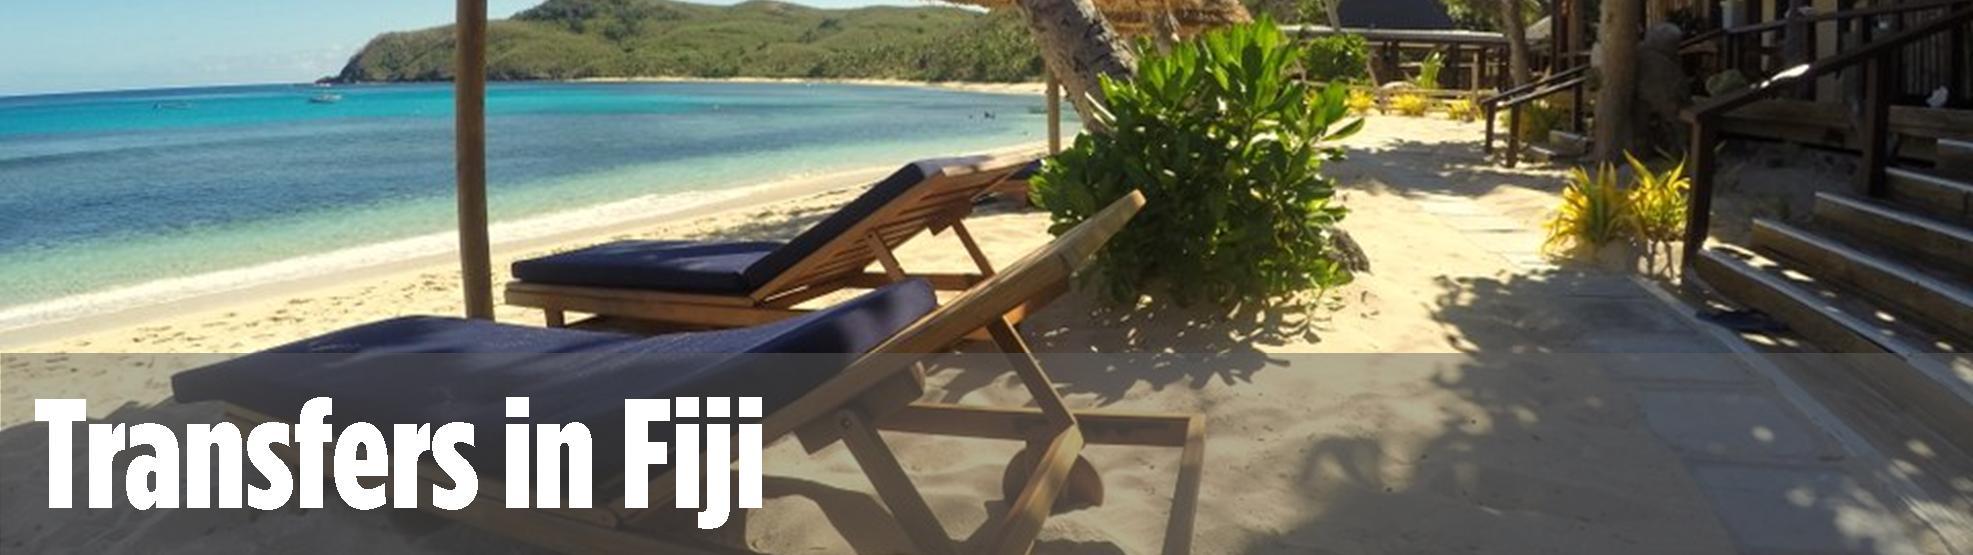 Transfers in Fiji, Yasawa Flyer, Hotel & airport transfers